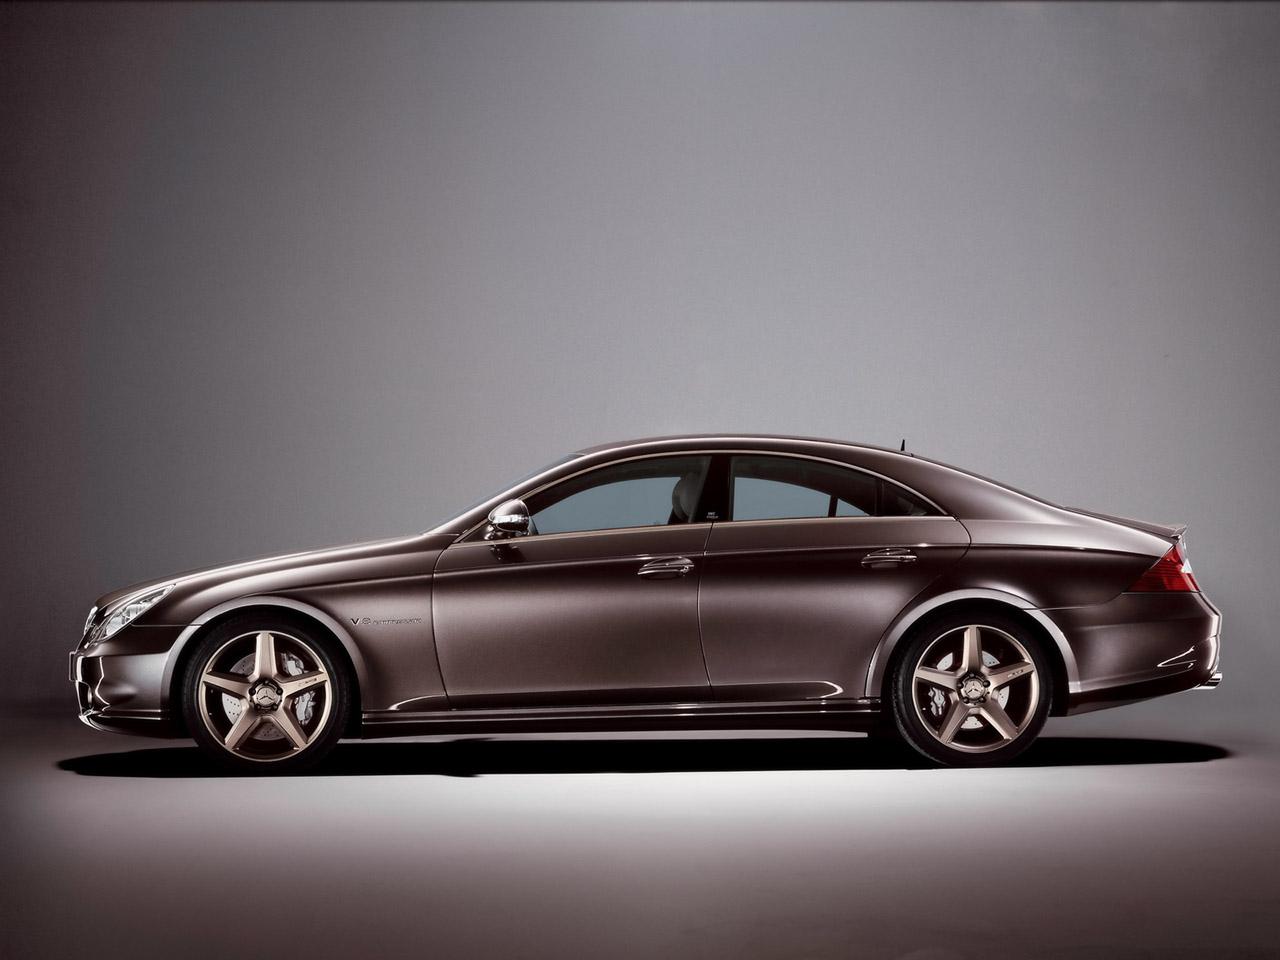 Mercedes Benz CLS 55 AMG IWC